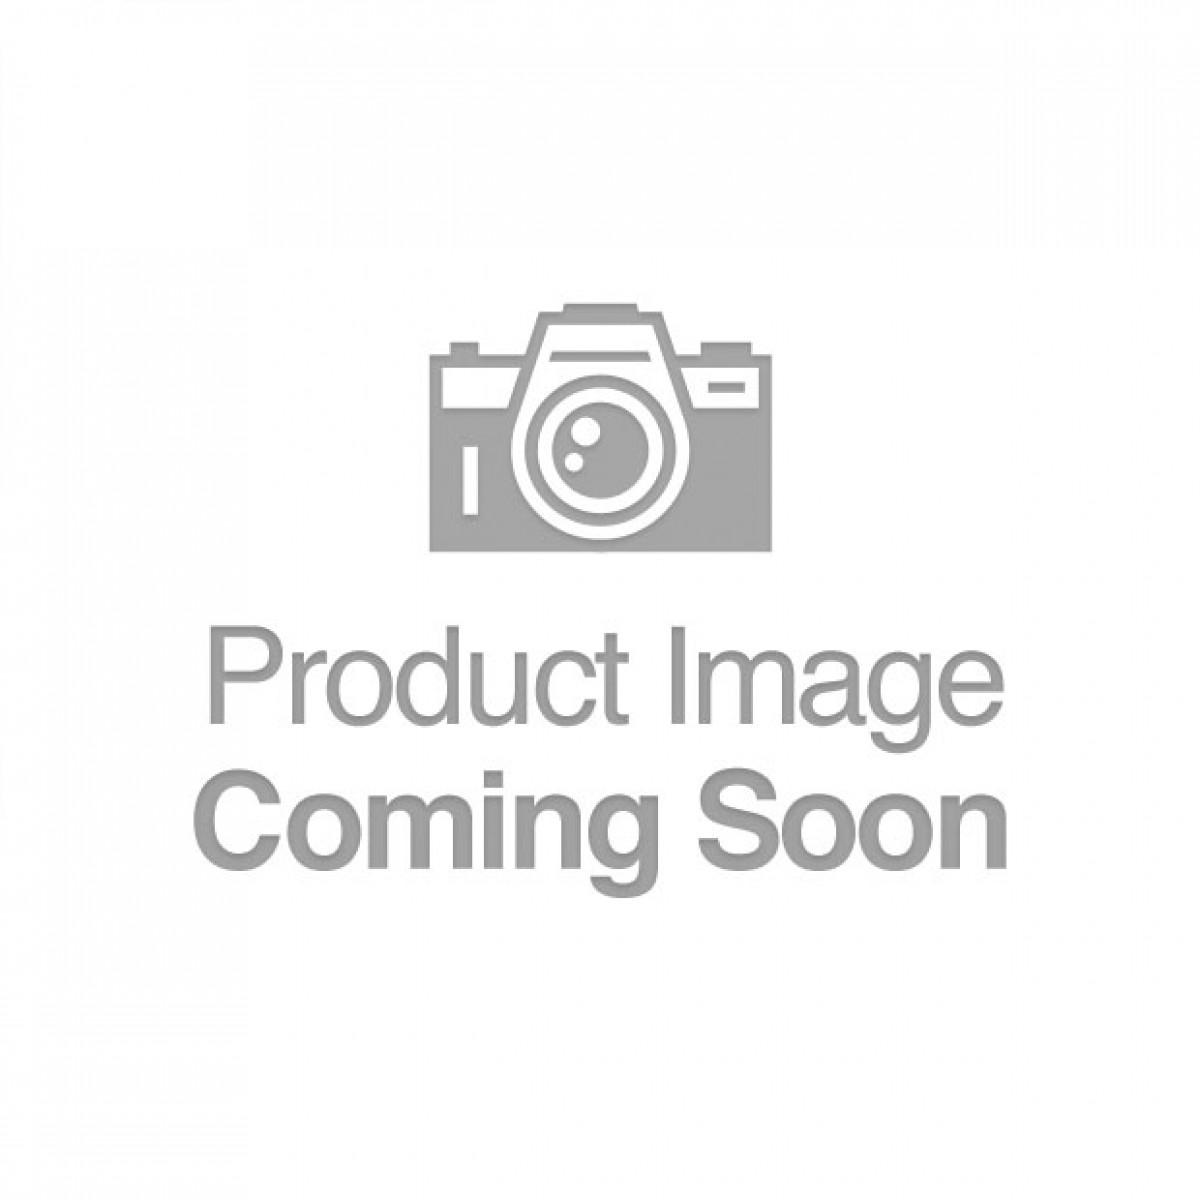 Nexus Gyro Vibe Unisex Rocker - Black